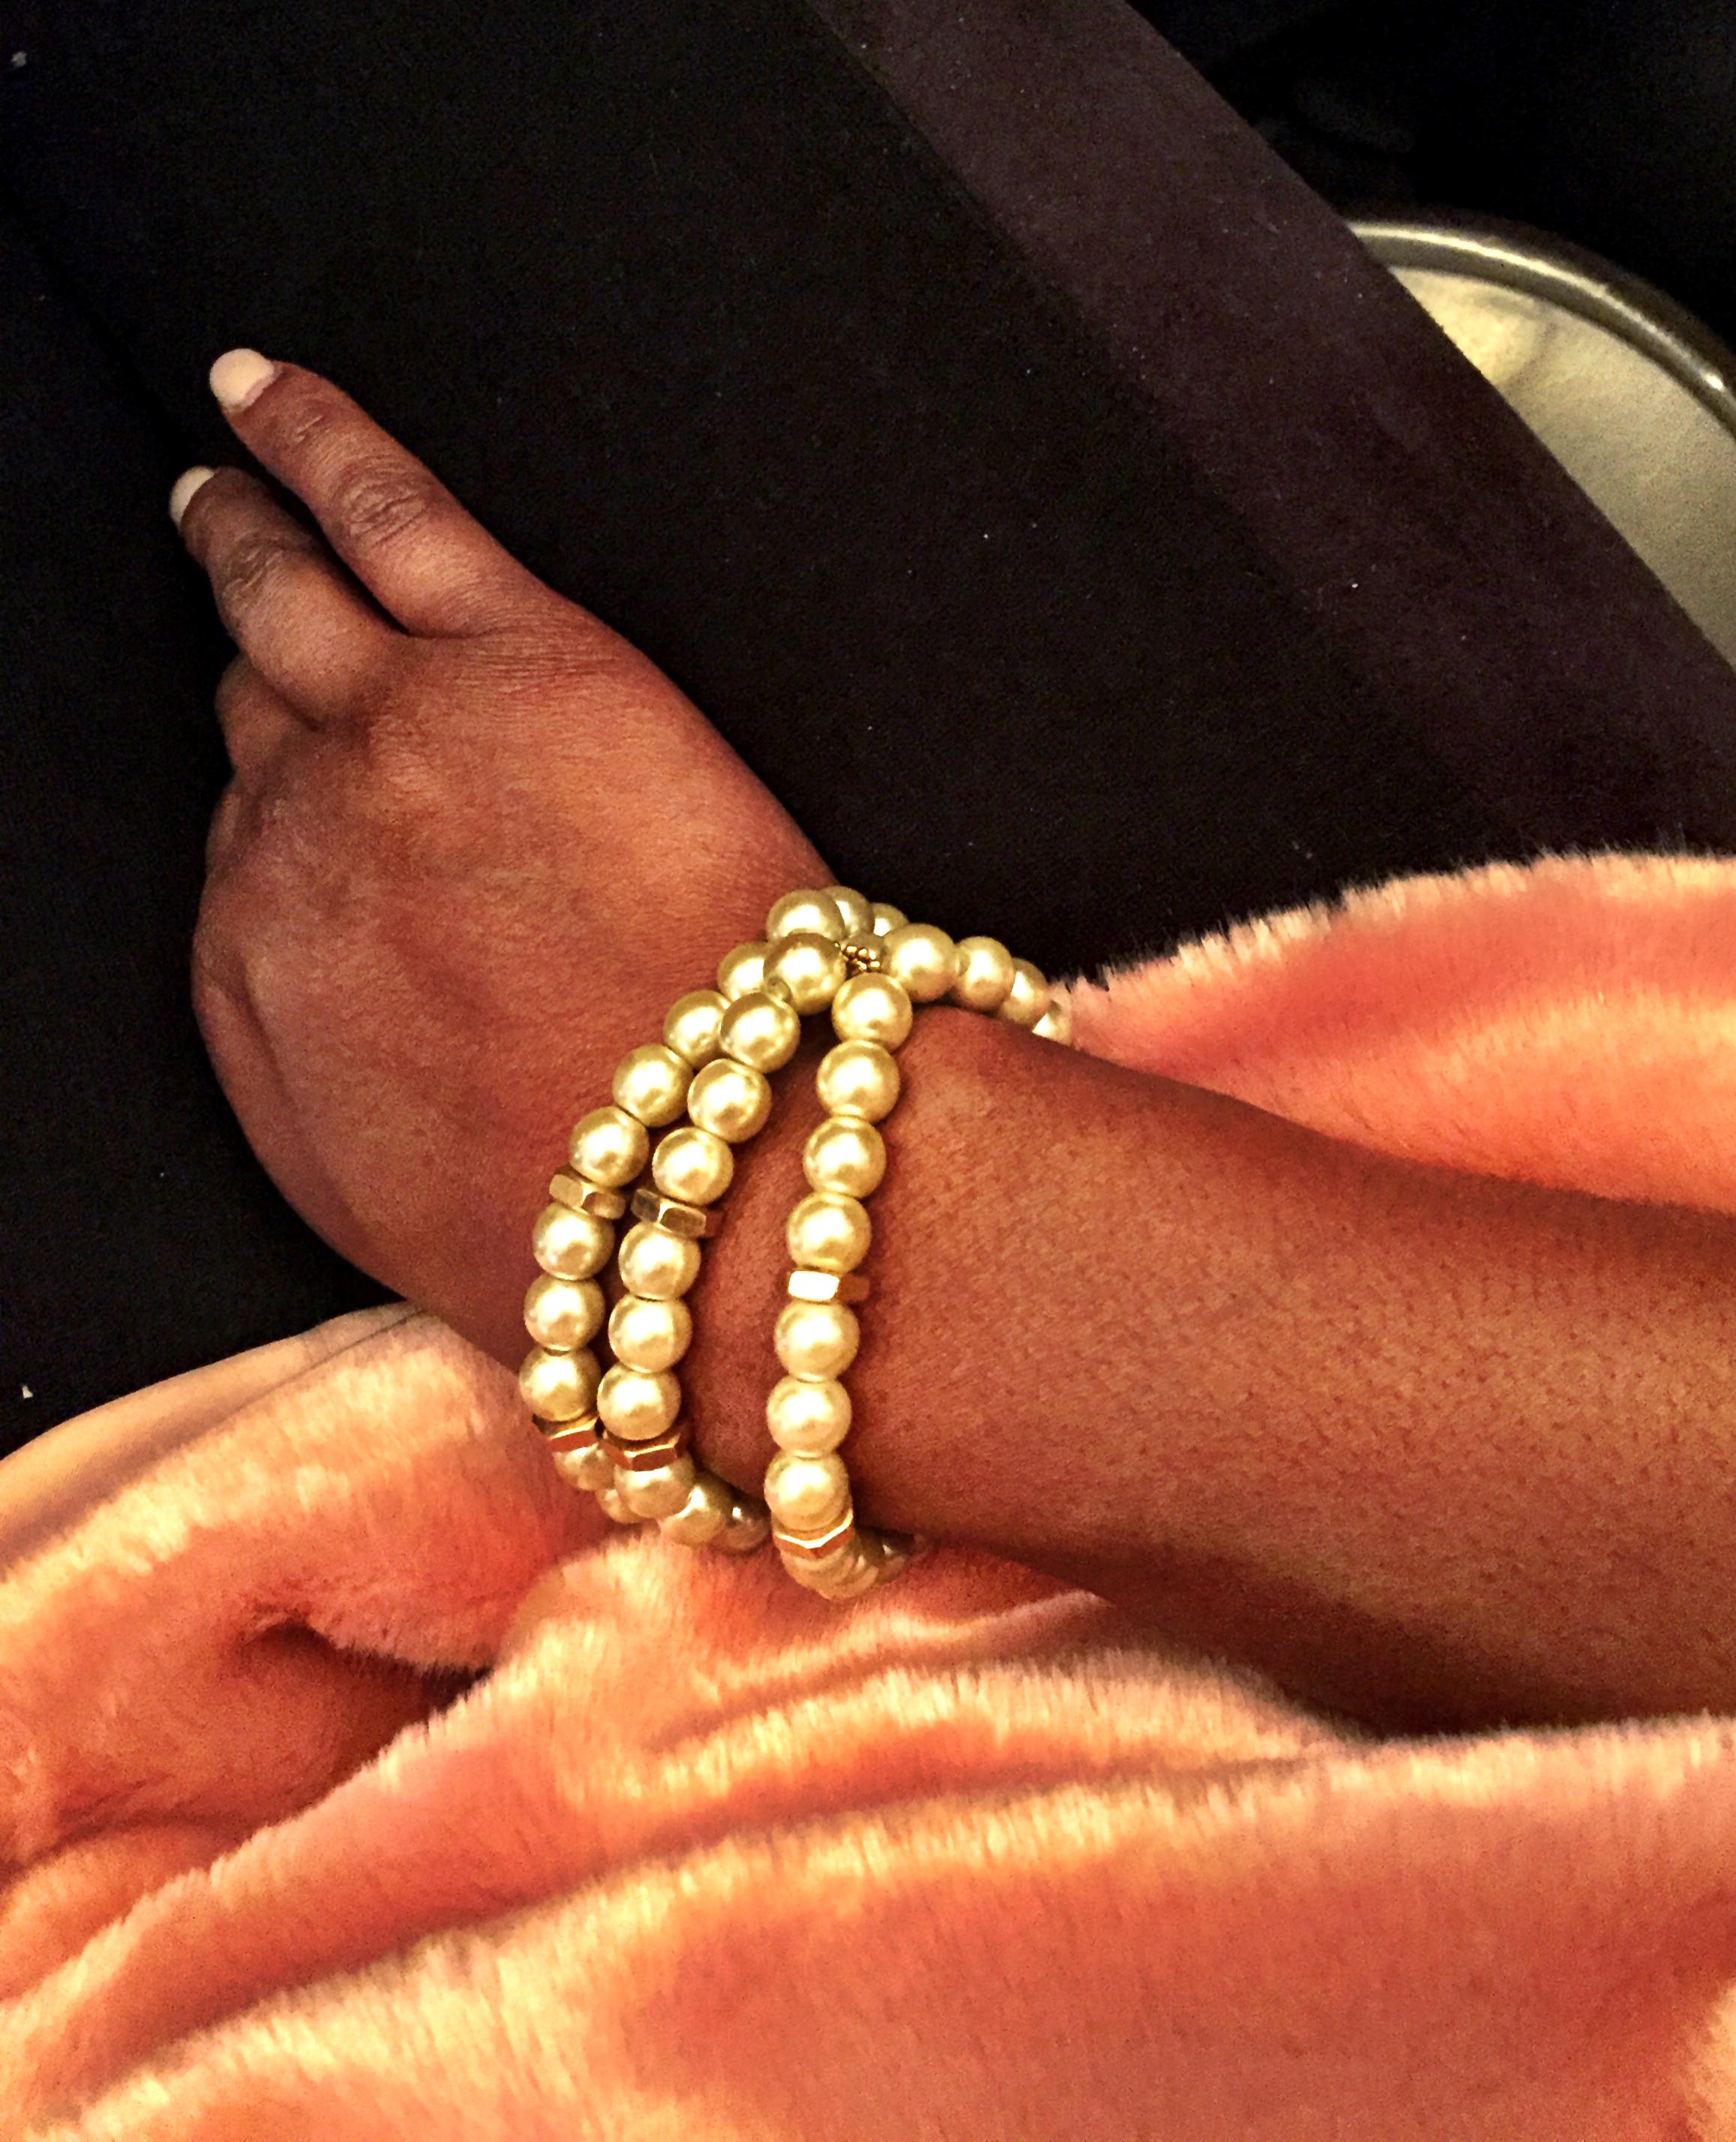 Cuddly Fur H&M Sweater, BCBG suede tights,& DollCirca1930 on the wrist